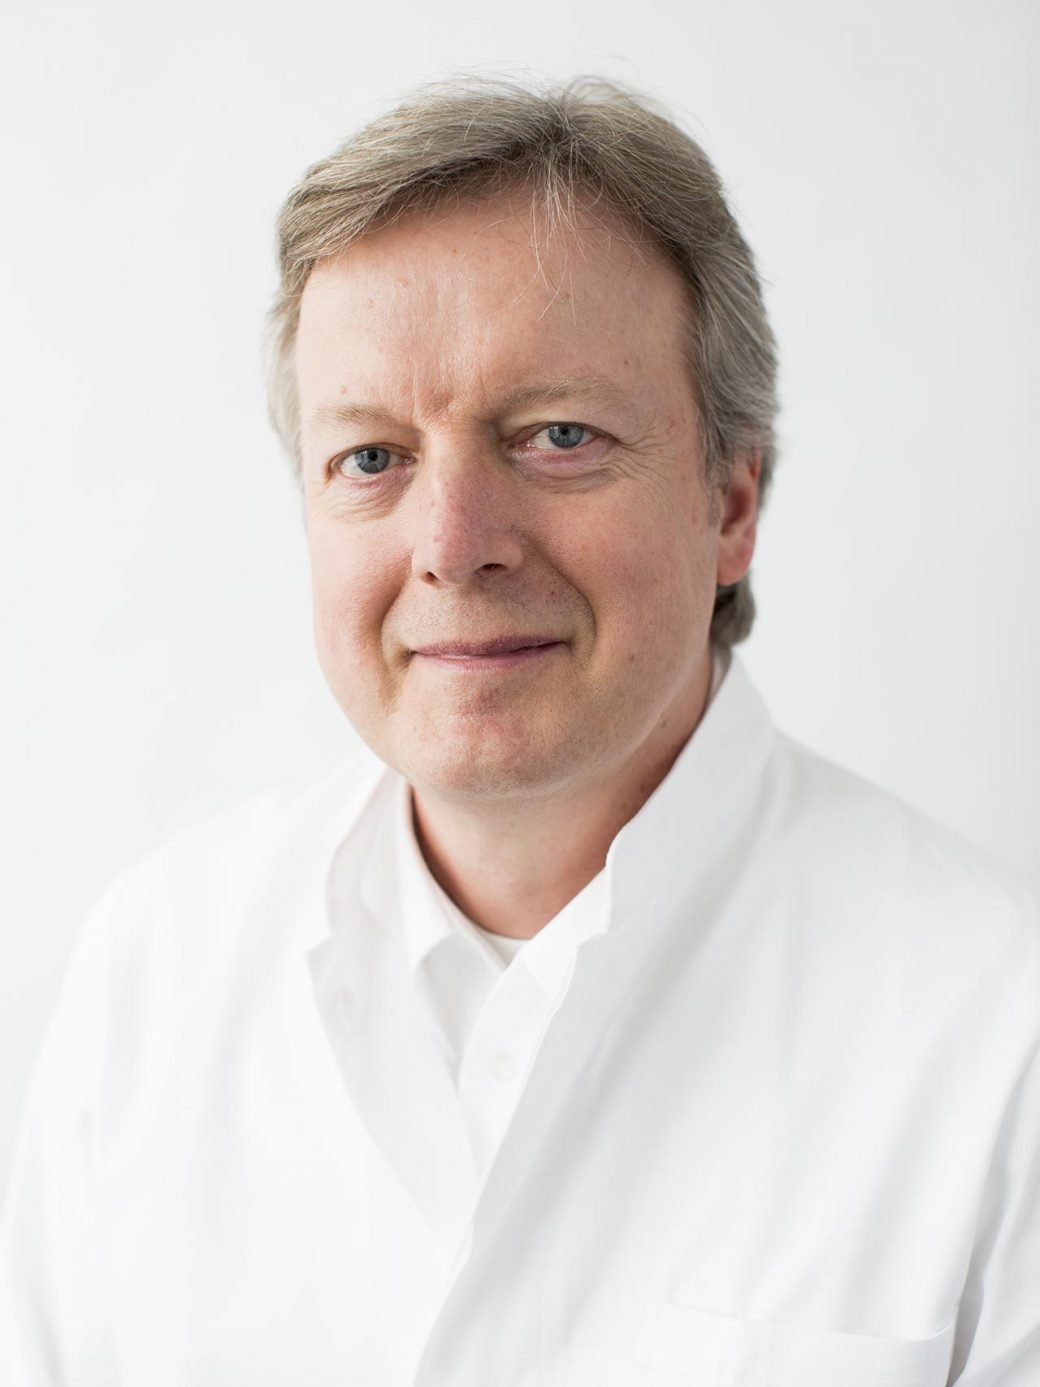 Kernspinzentrum Hamburg-Süd - Praxis - Dr. med. Christian Sprock